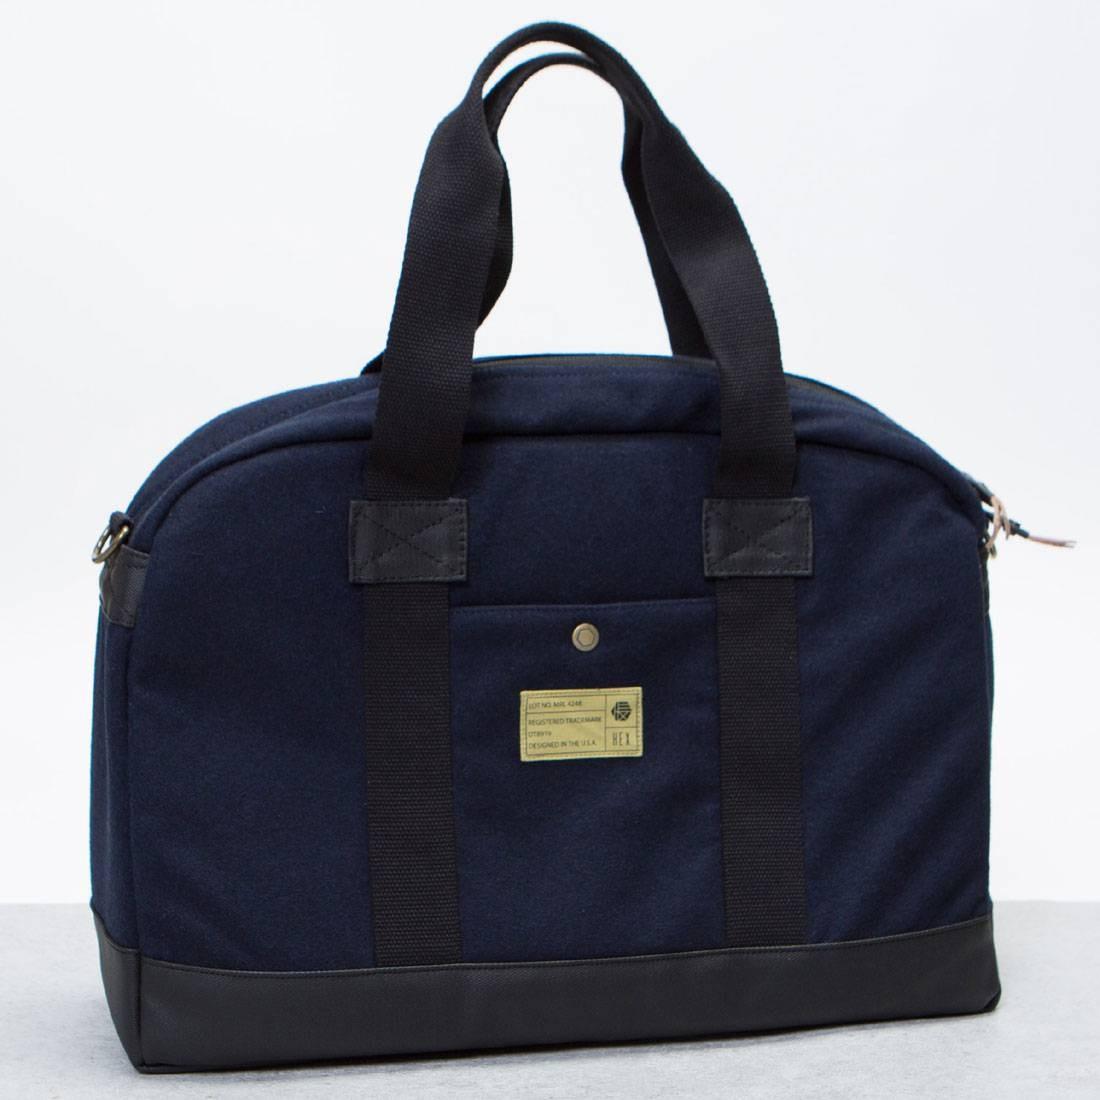 Hex Laptop Duffel Bag (navy / wool)